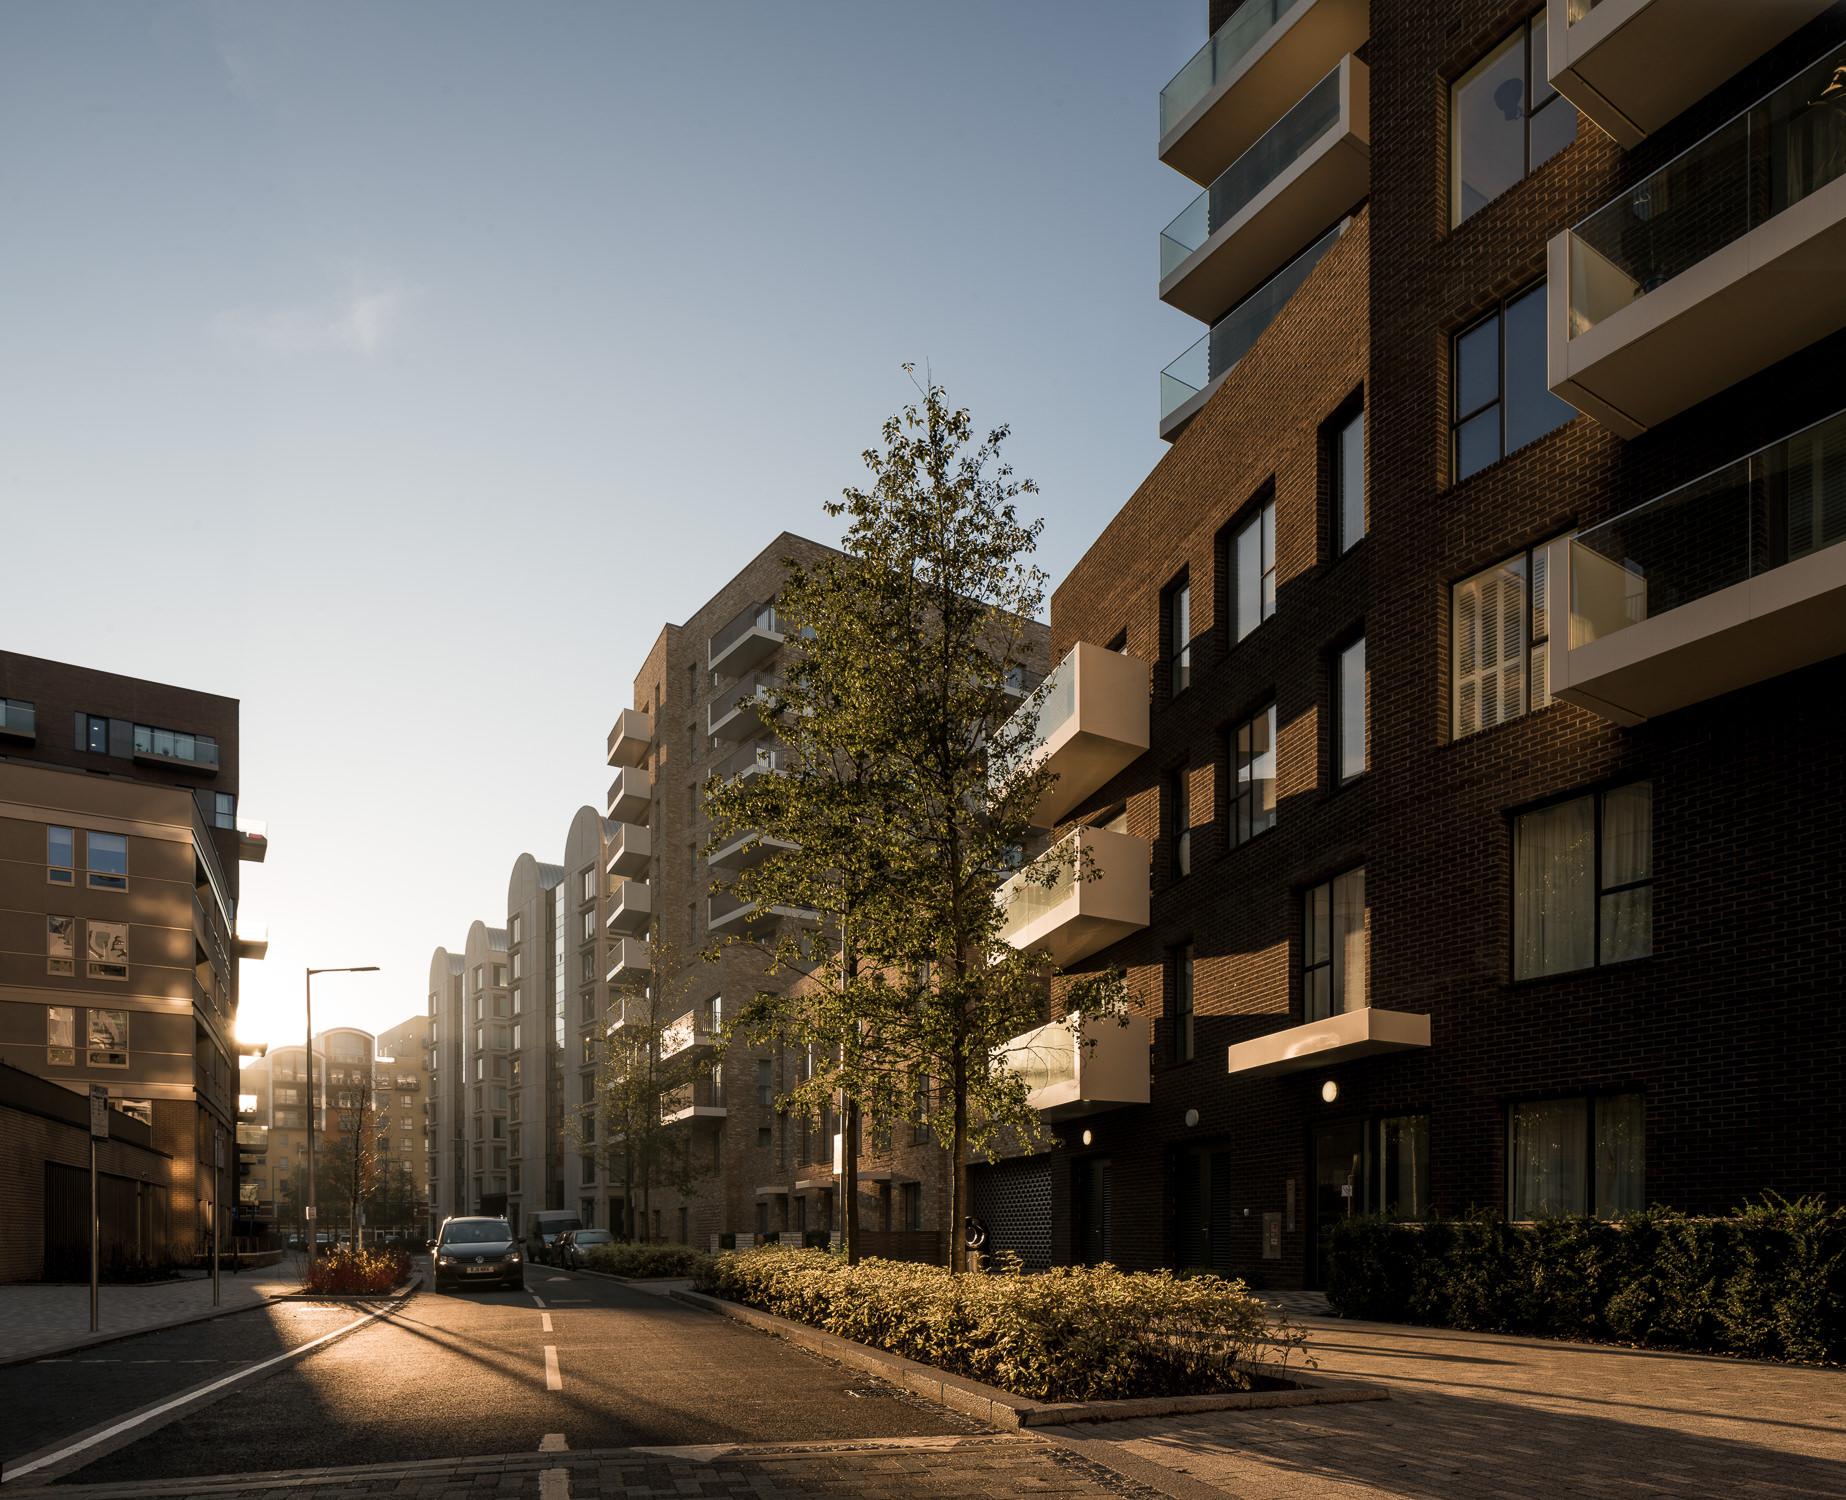 mark-hadden-architecture-photographer-architectuur-interieur-fotografie-london-amsterdam-Energy Centre-098.jpg